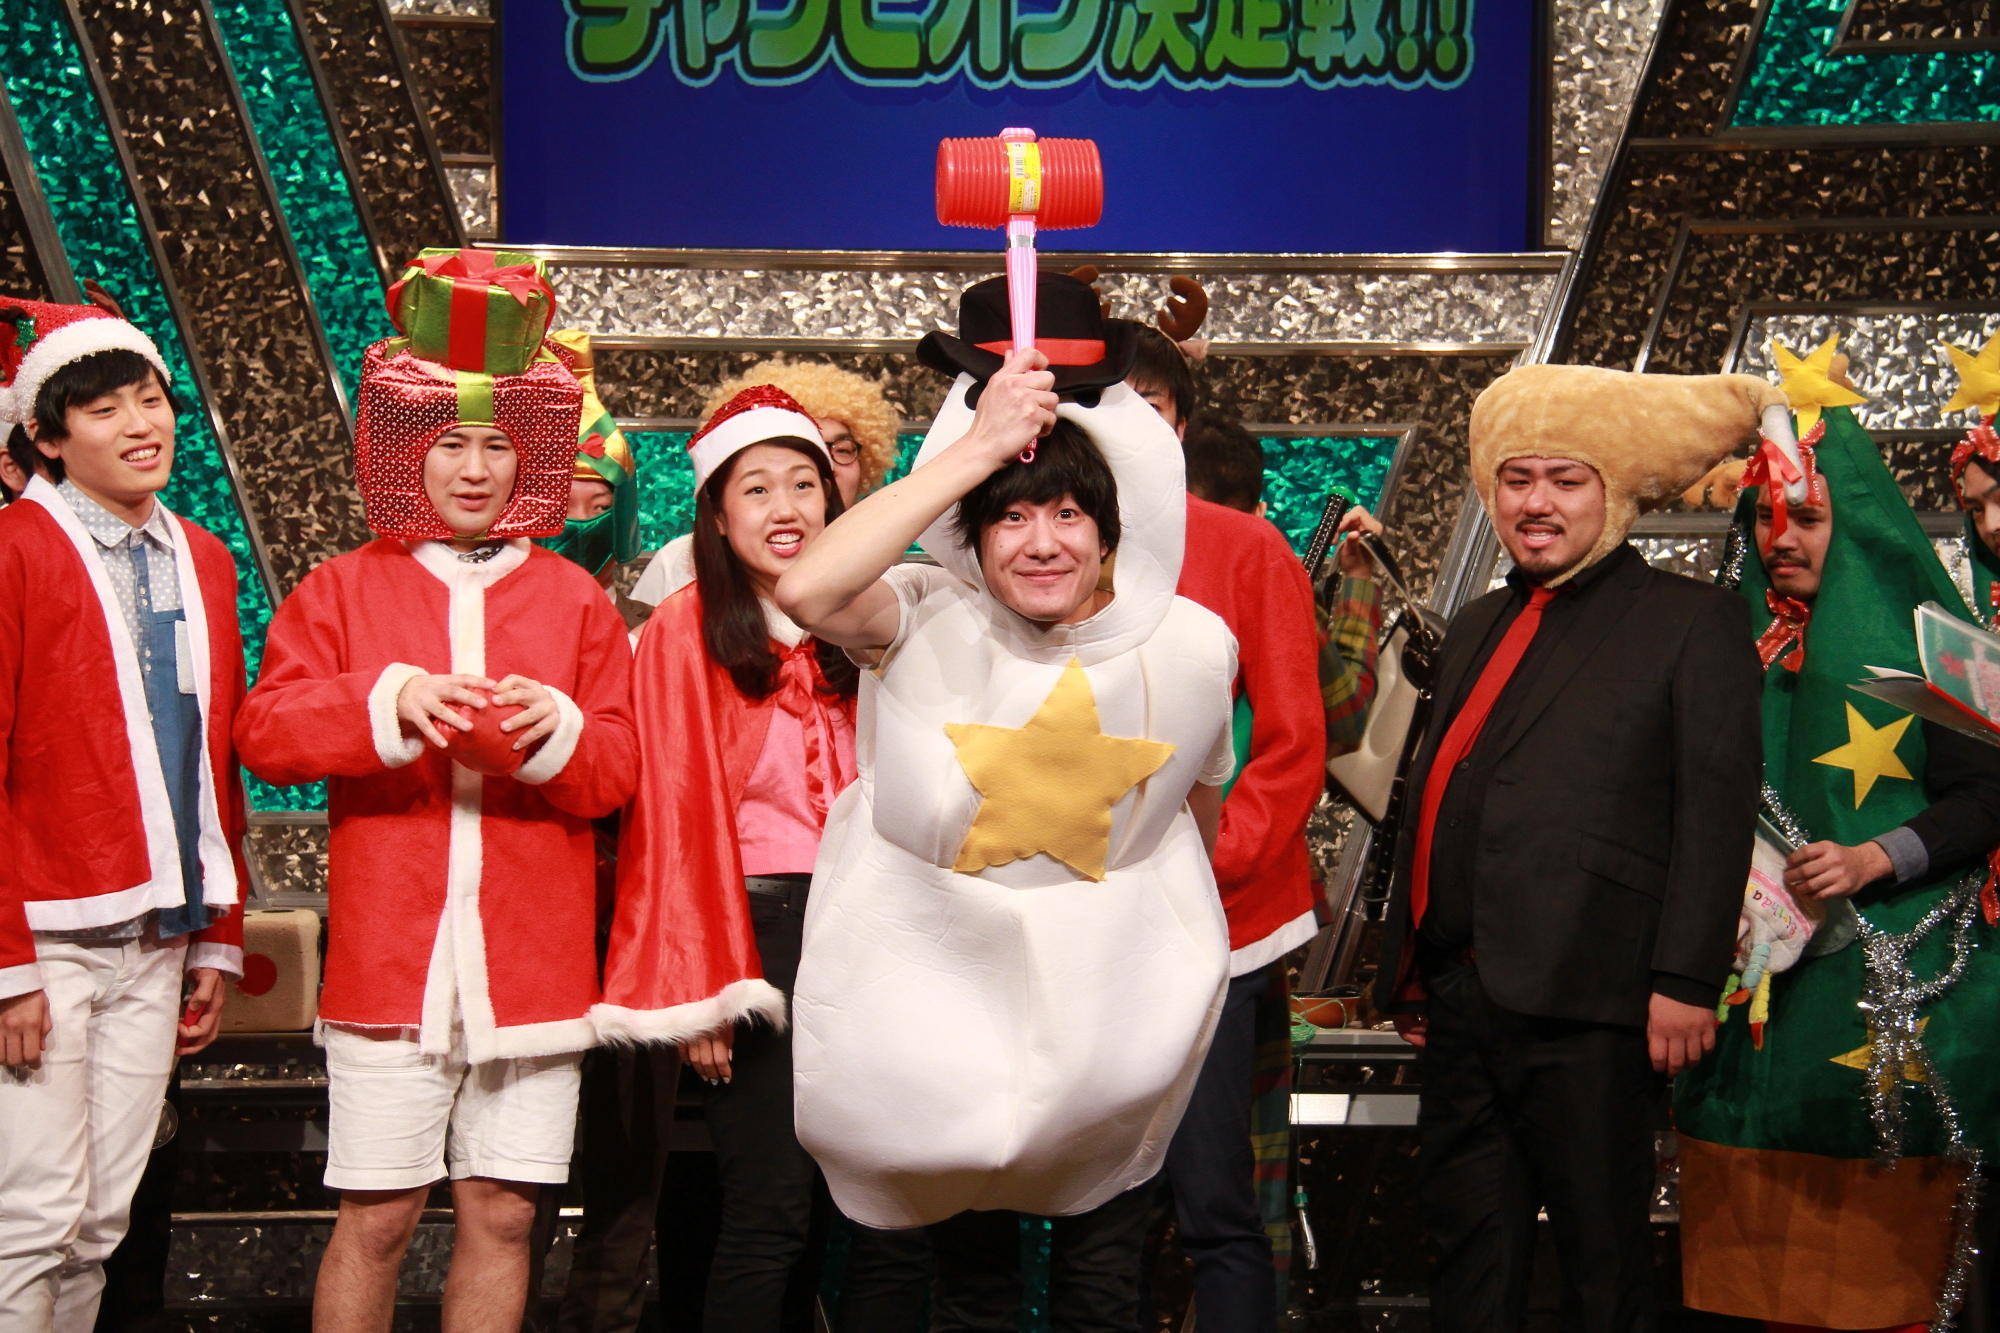 http://news.yoshimoto.co.jp/20151230122337-b93c5bece06573ad2129ef946761a5cf59fcec58.jpg